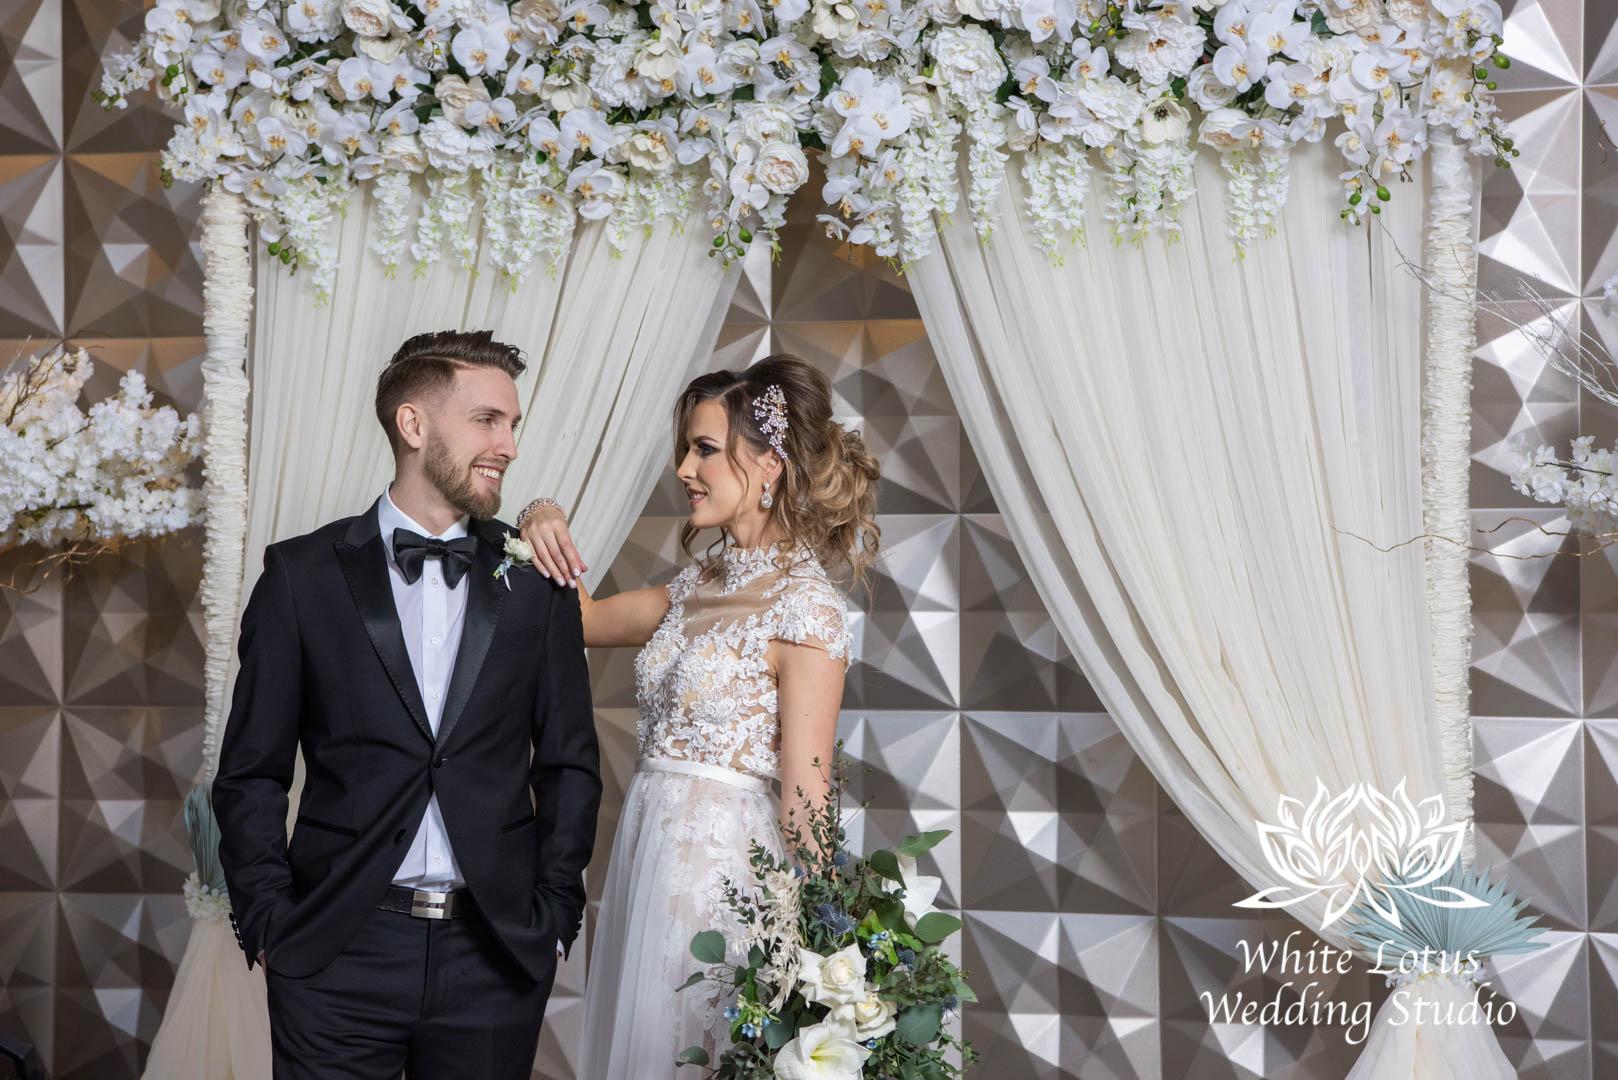 046- GLAM WINTERLUXE WEDDING INSPIRATION